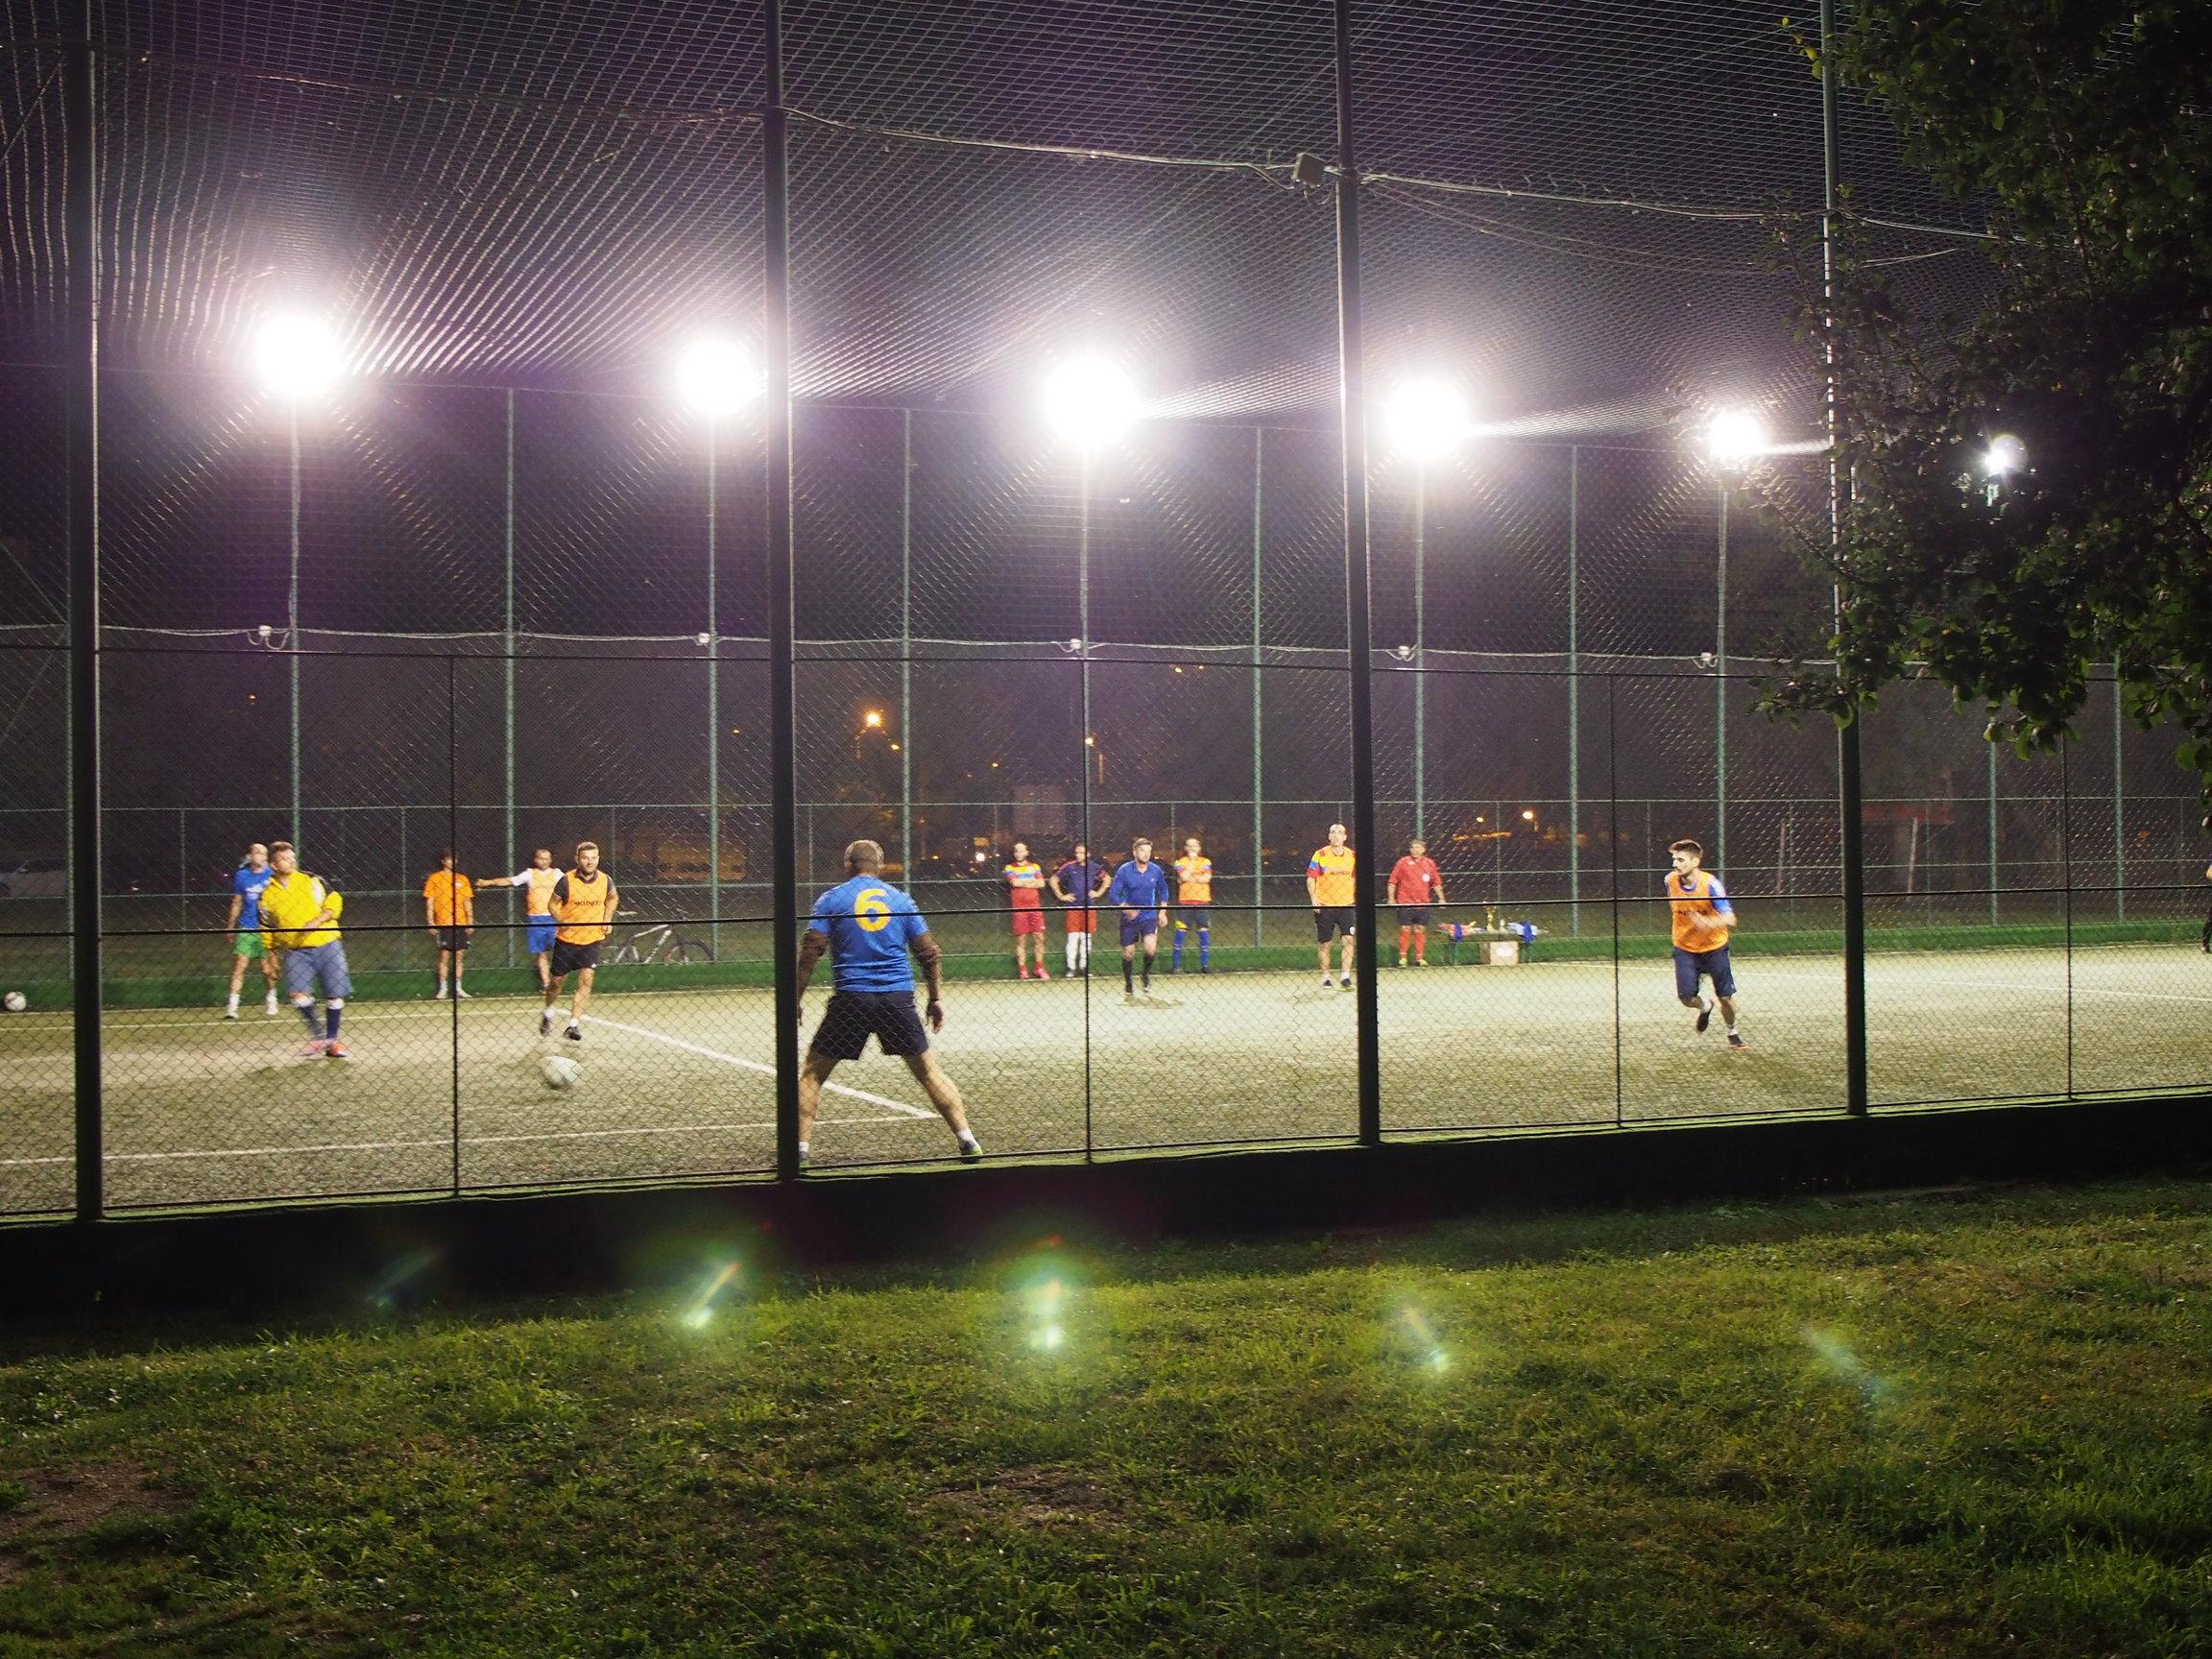 terenuri fotbal sintetice cluj.jpg